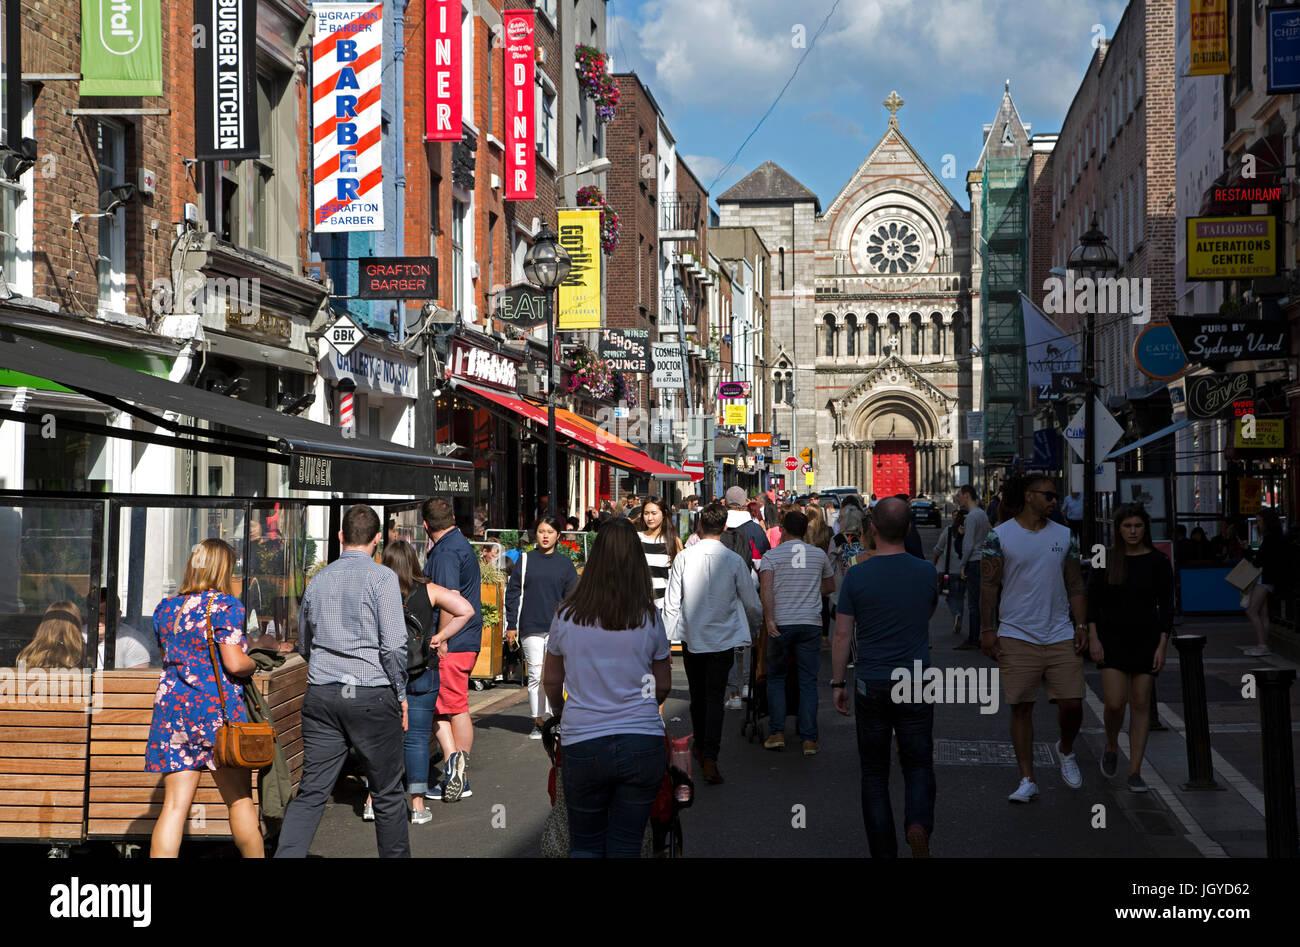 c90dc2f03de71 Dublin City Centre Lifestyle Stock Photos & Dublin City Centre ...